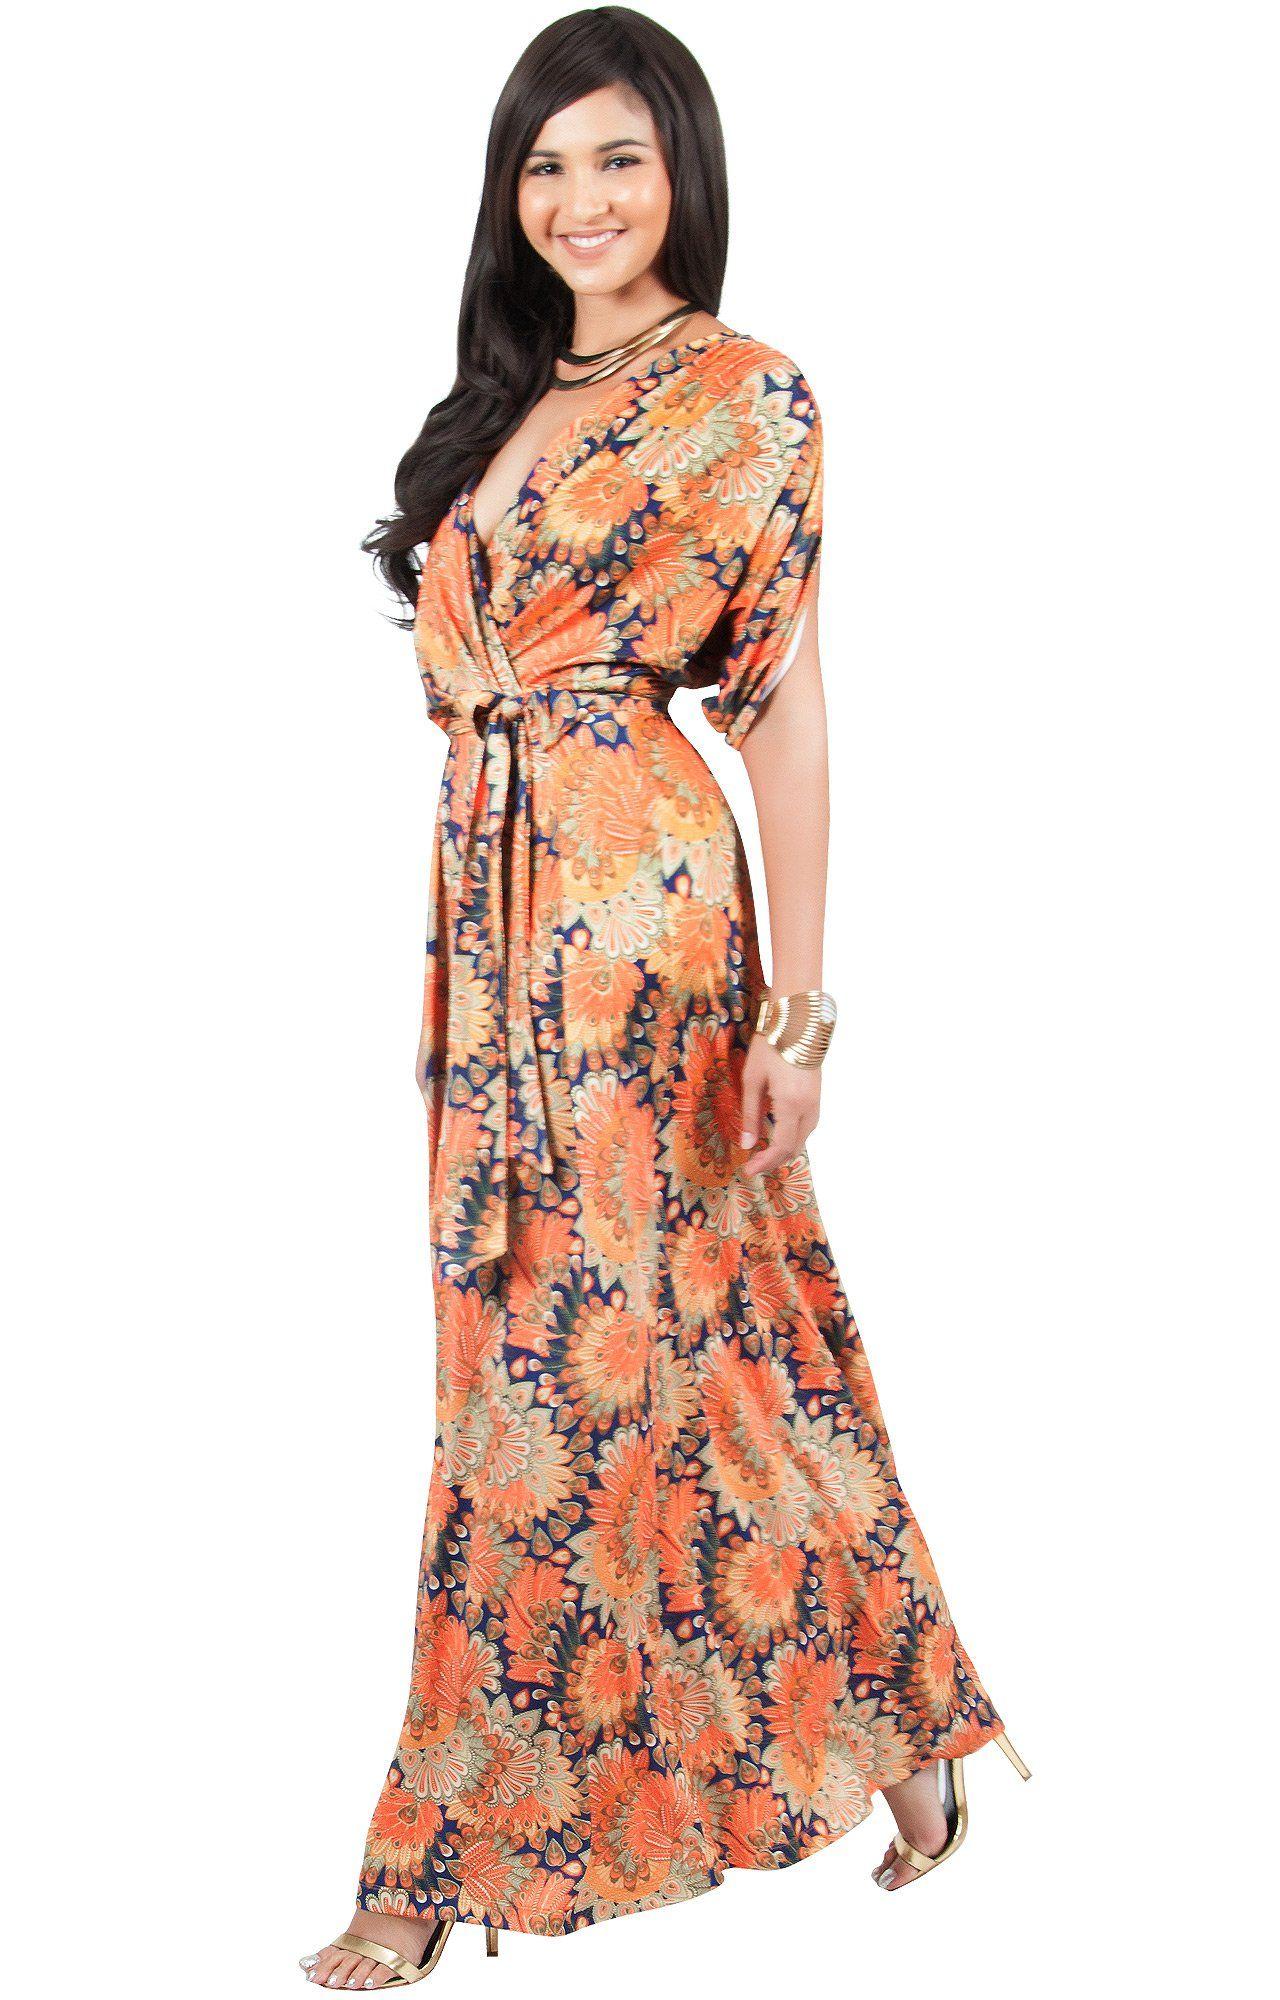 Koh koh plus size womens long bohemian boho short sleeve summer